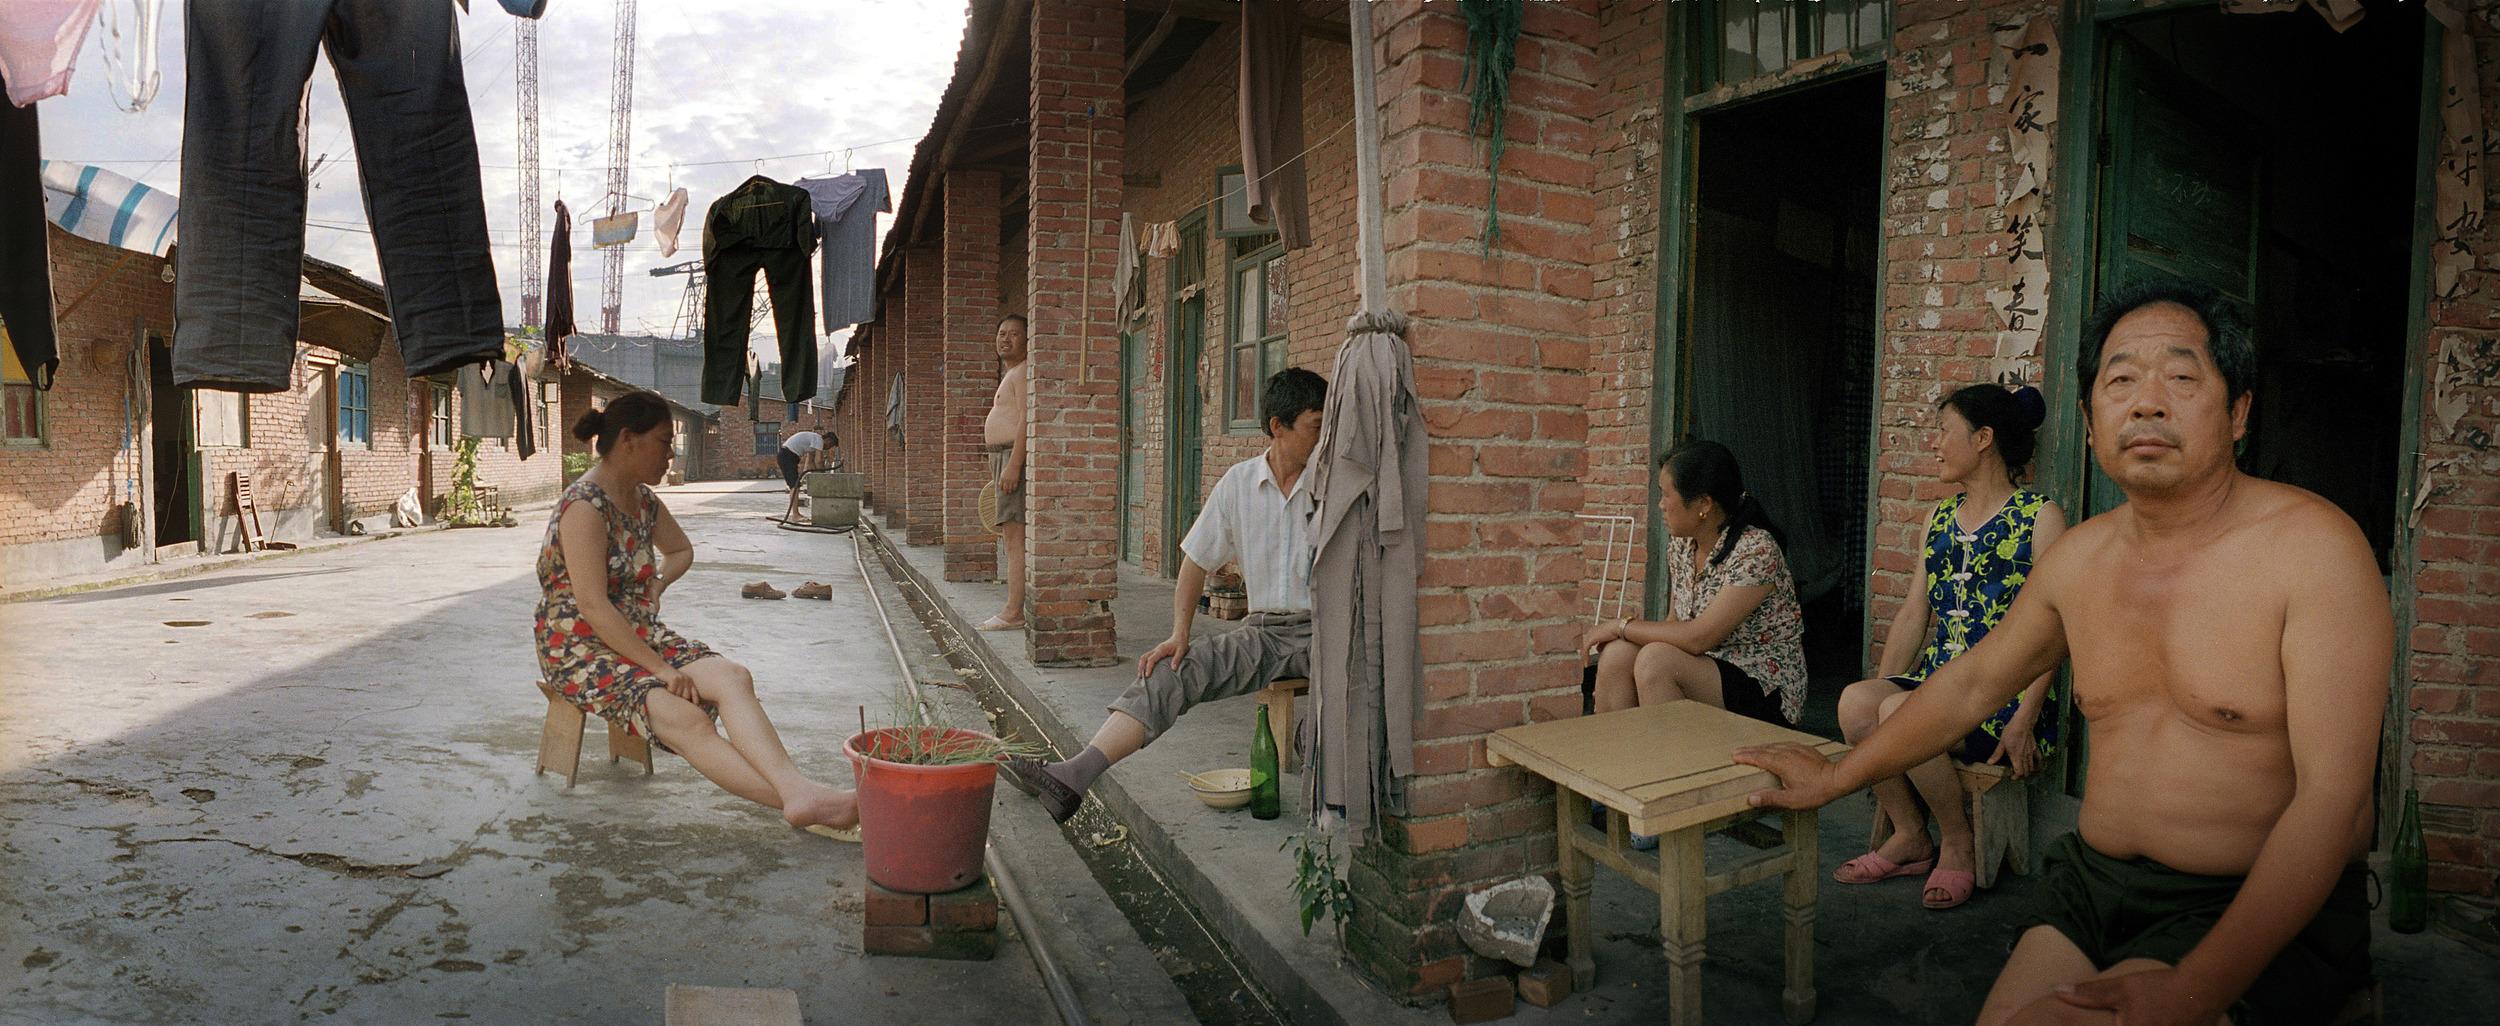 China, Nr. Yichang, Yangtze river